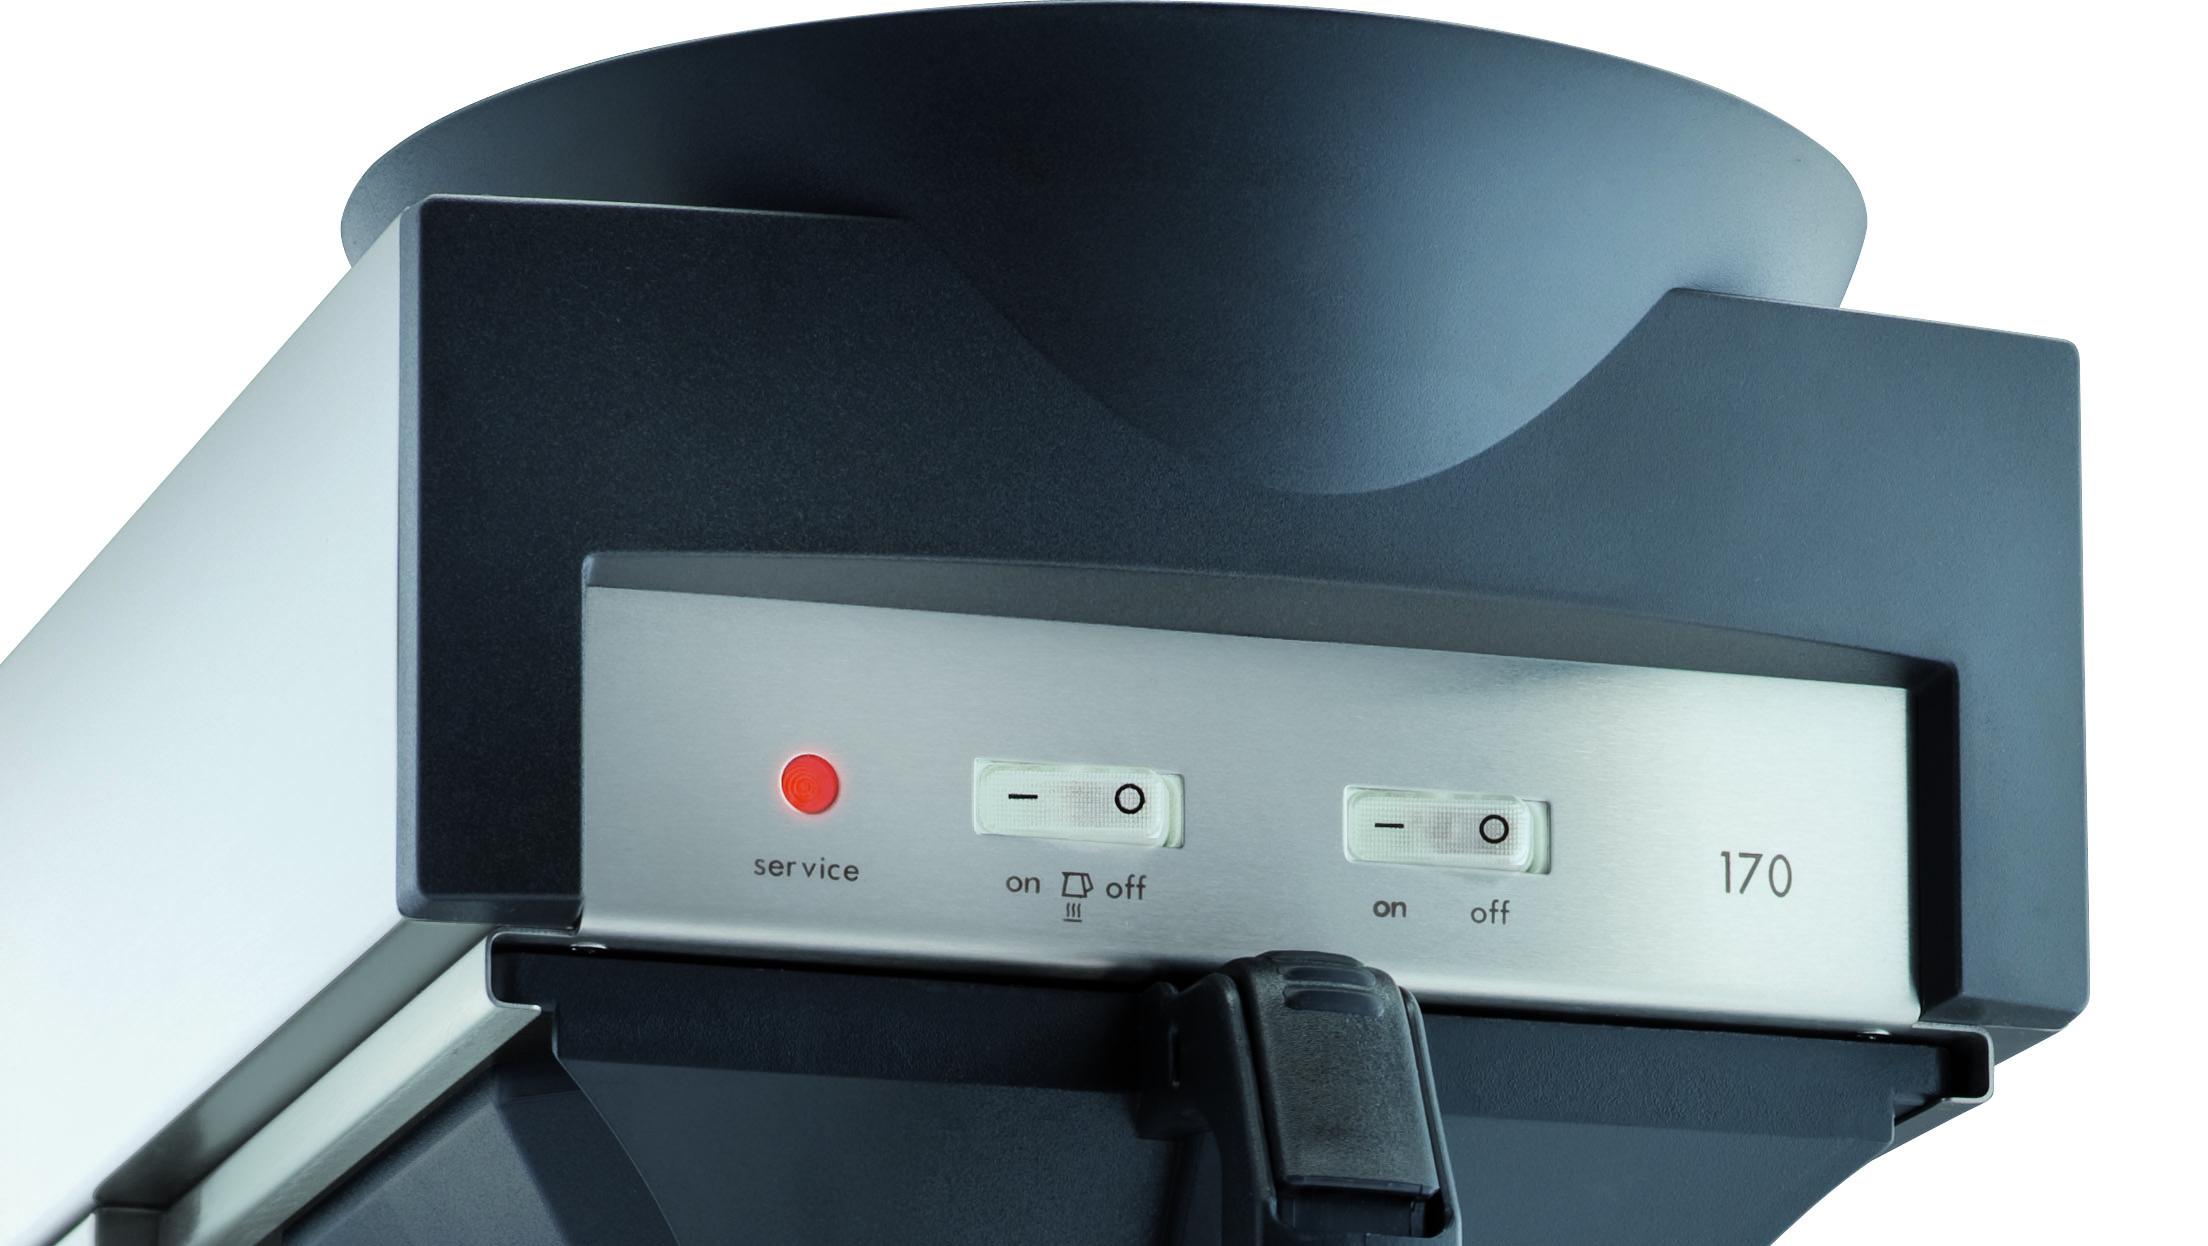 melitta filterkaffeemaschine m 170 m online shop gastparo. Black Bedroom Furniture Sets. Home Design Ideas